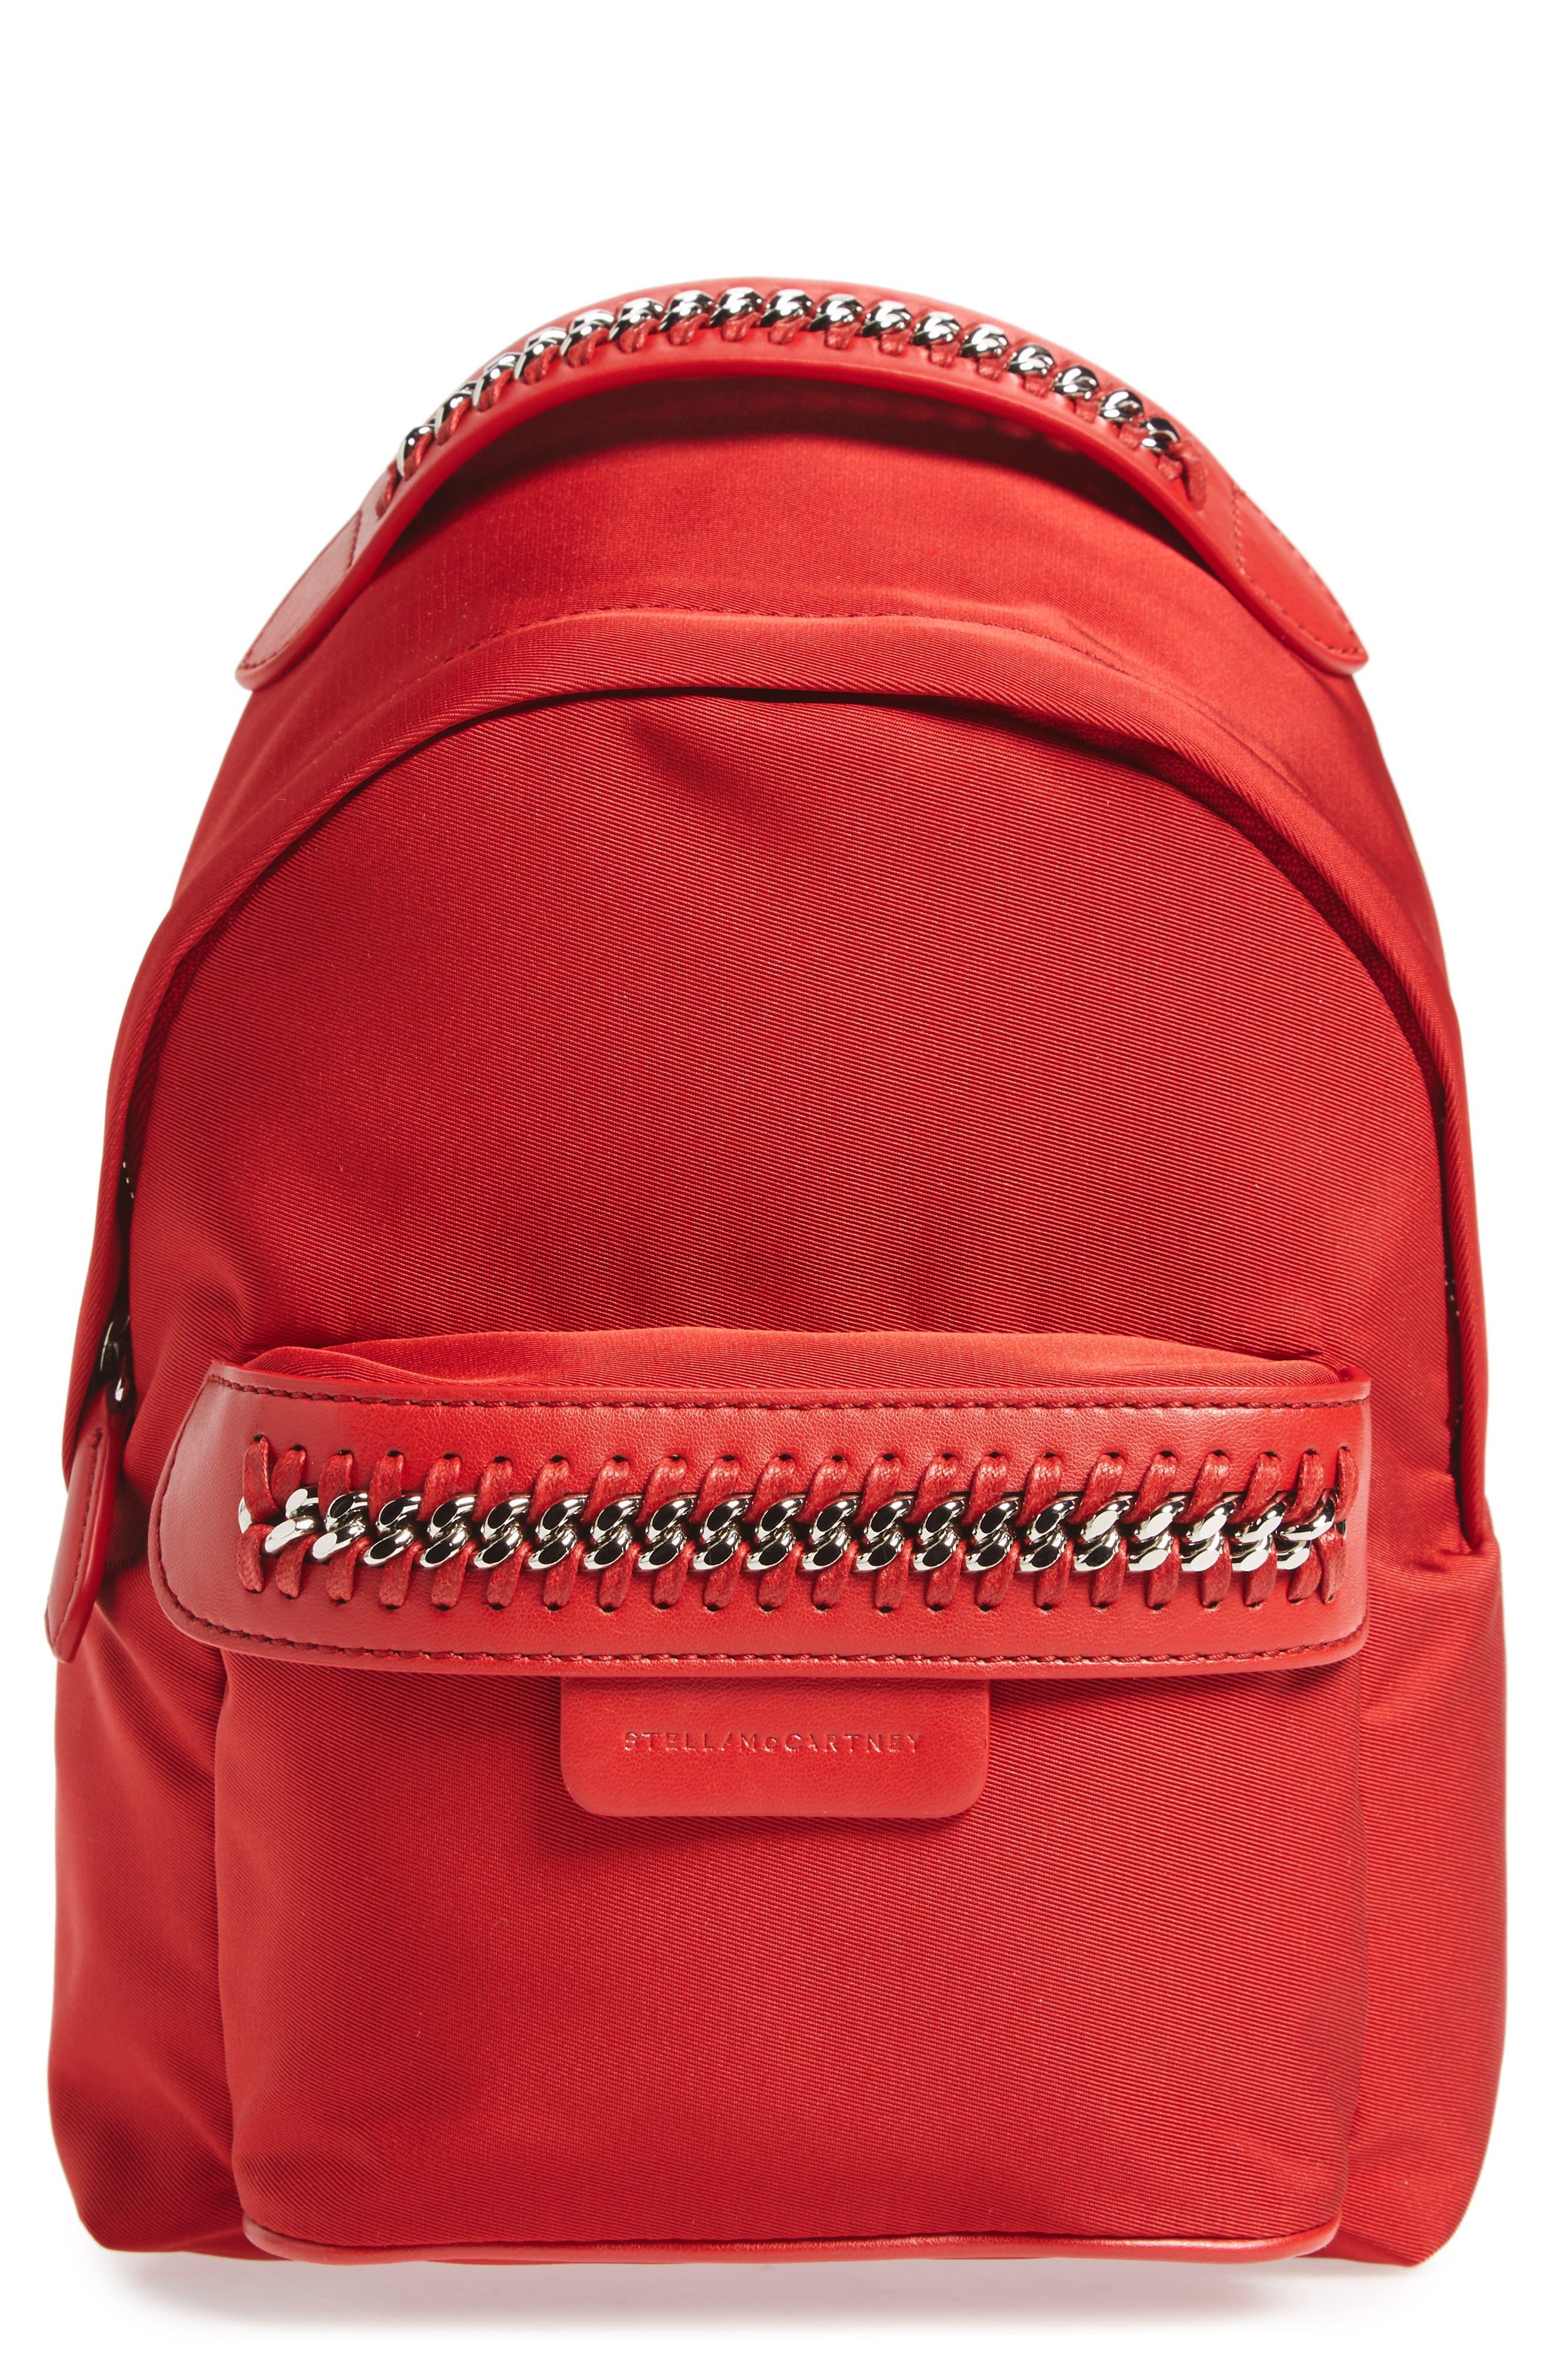 Alternate Image 1 Selected - Stella McCartney Mini Falabella Nylon Backpack